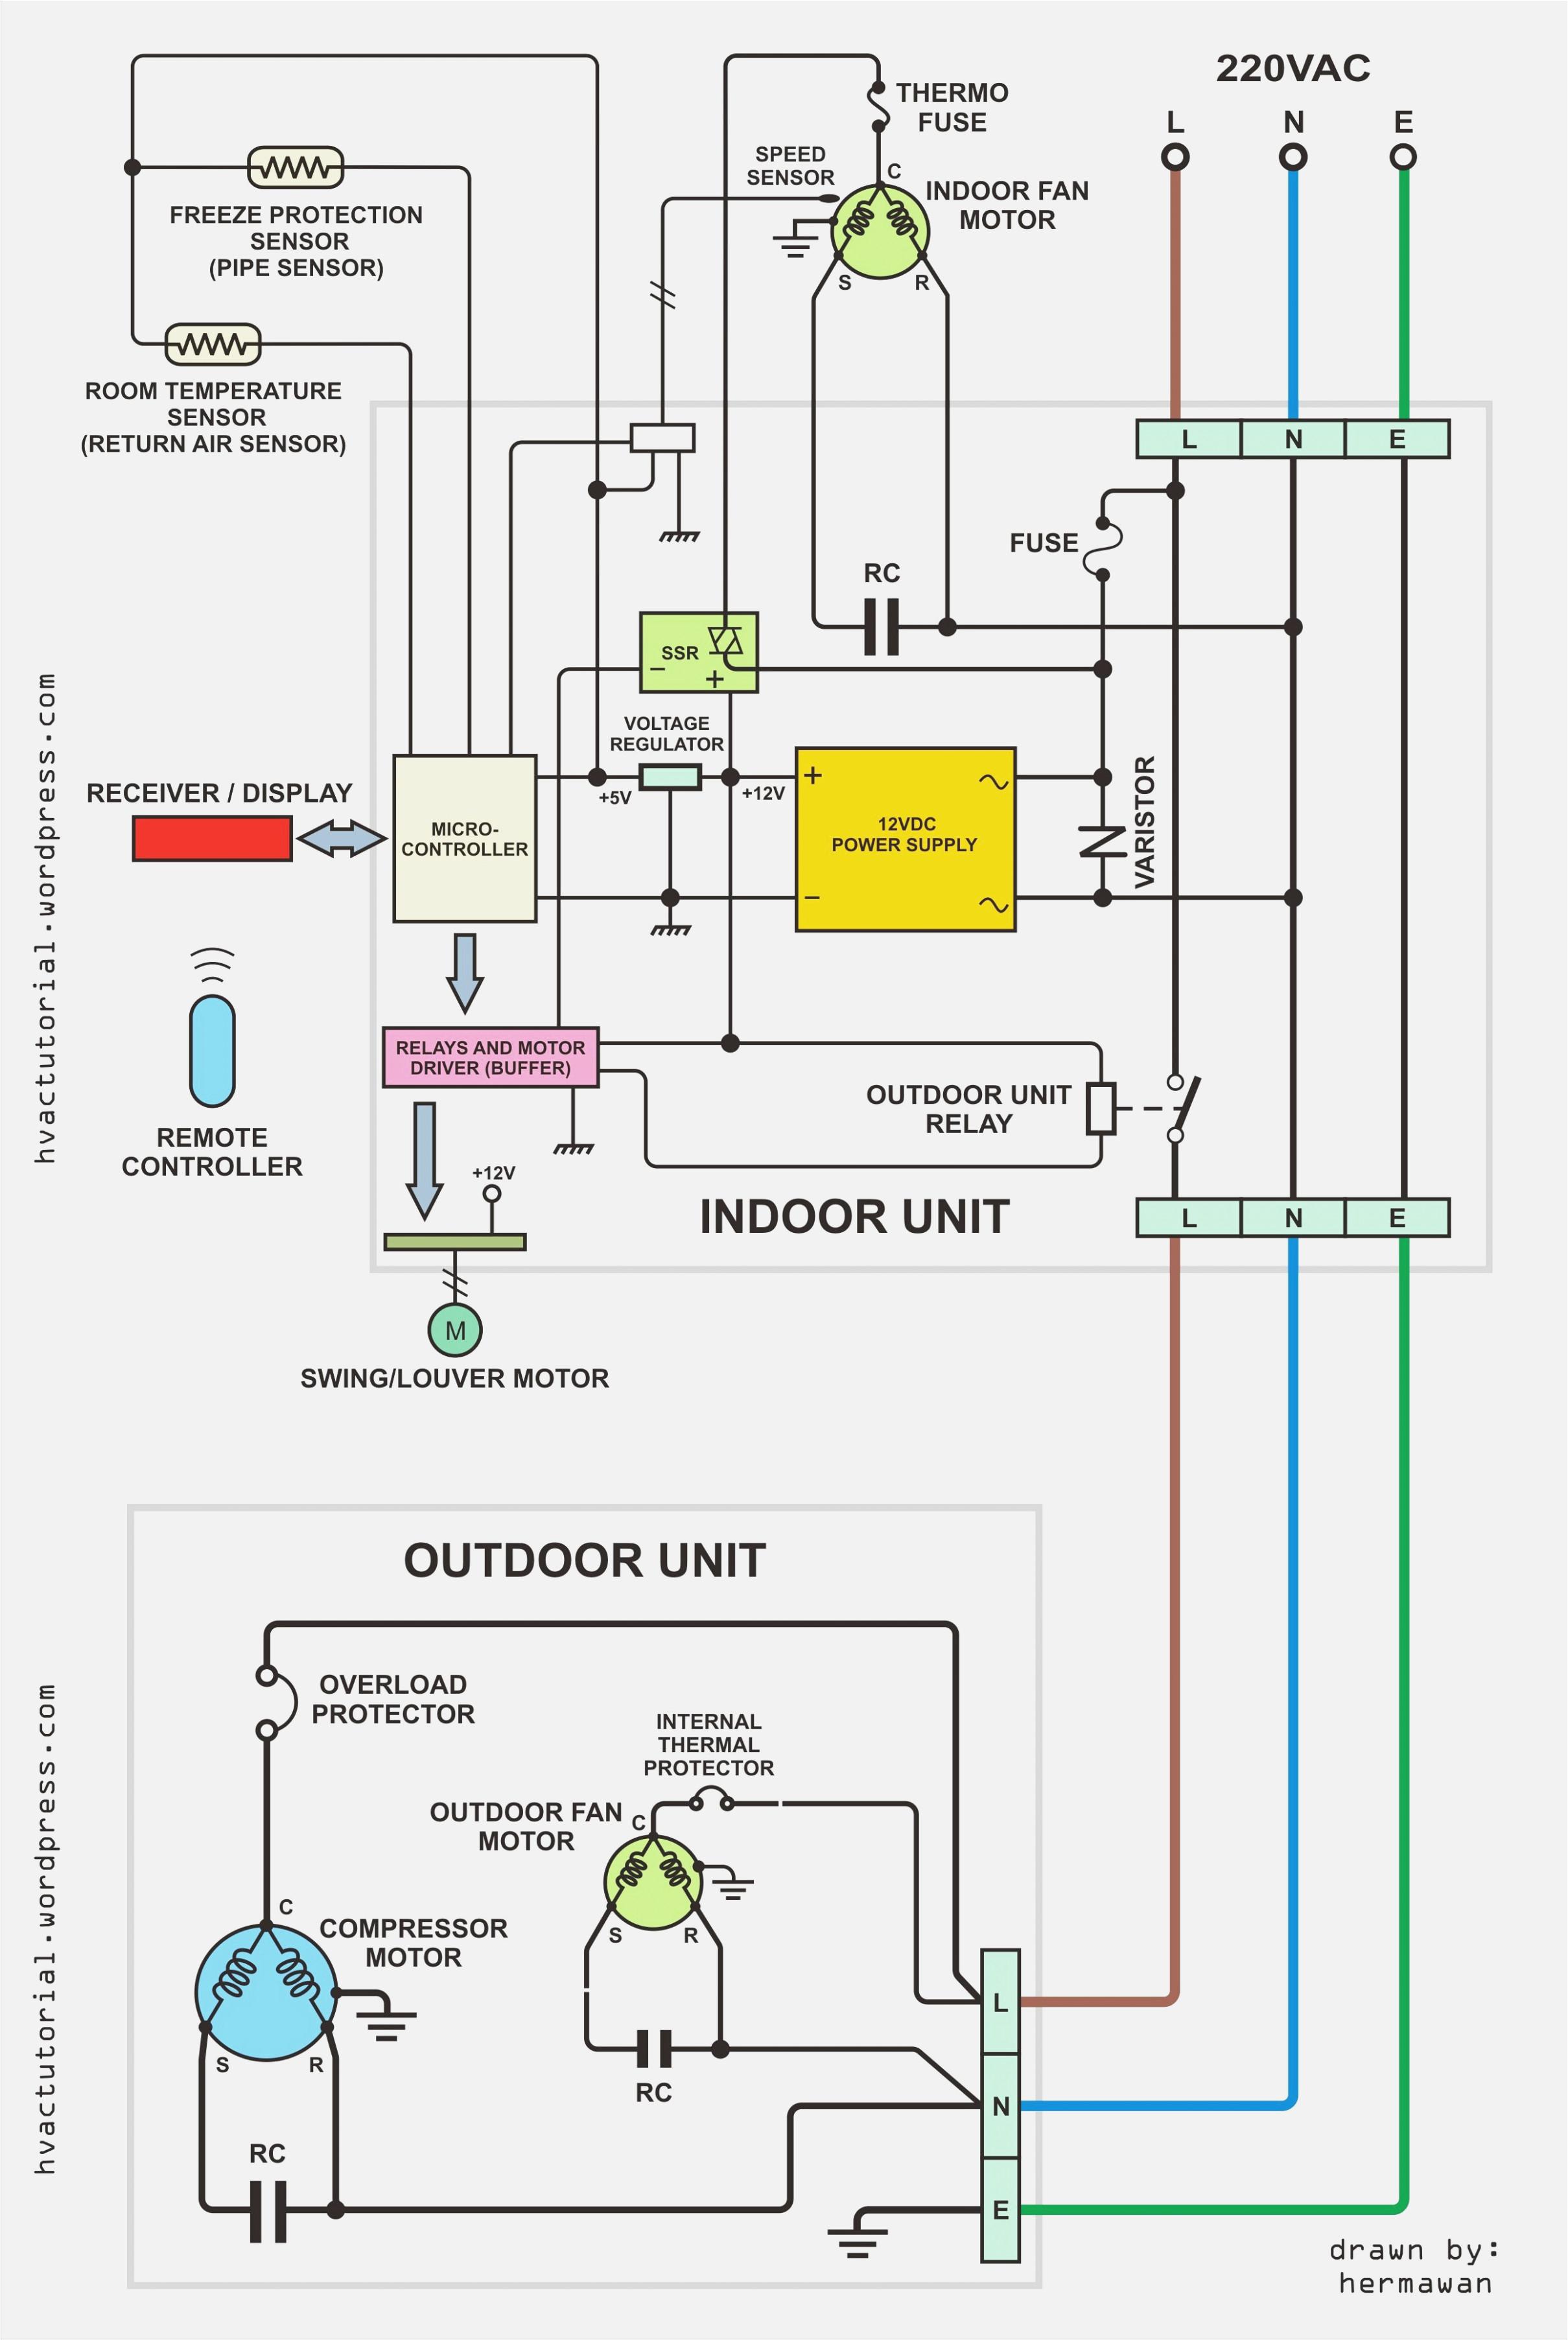 nordyne compressor wiring diagram wiring diagram new model nordyne diagram wiring b3bv0024k a